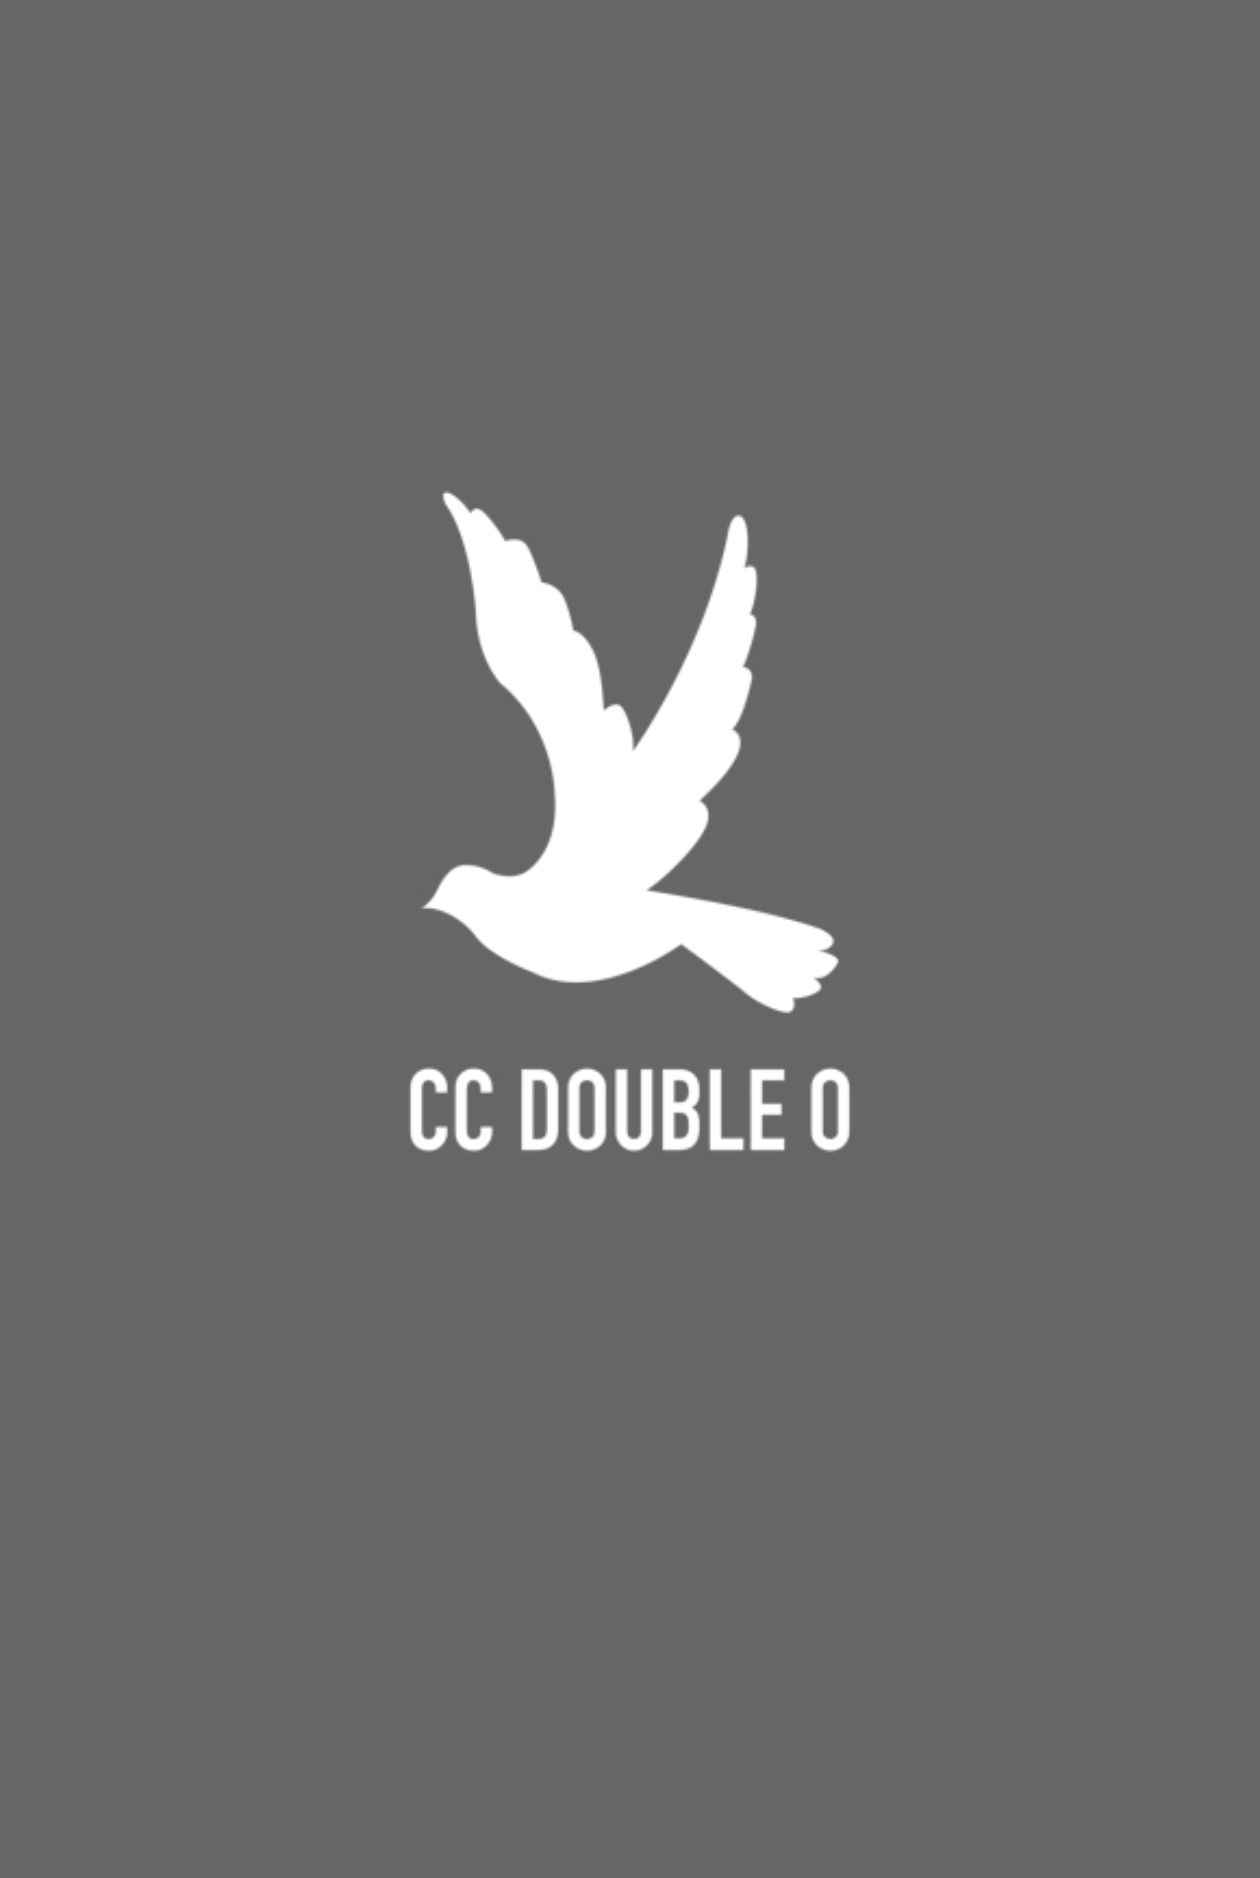 CC DOUBLE O LOGO PATENT CAP